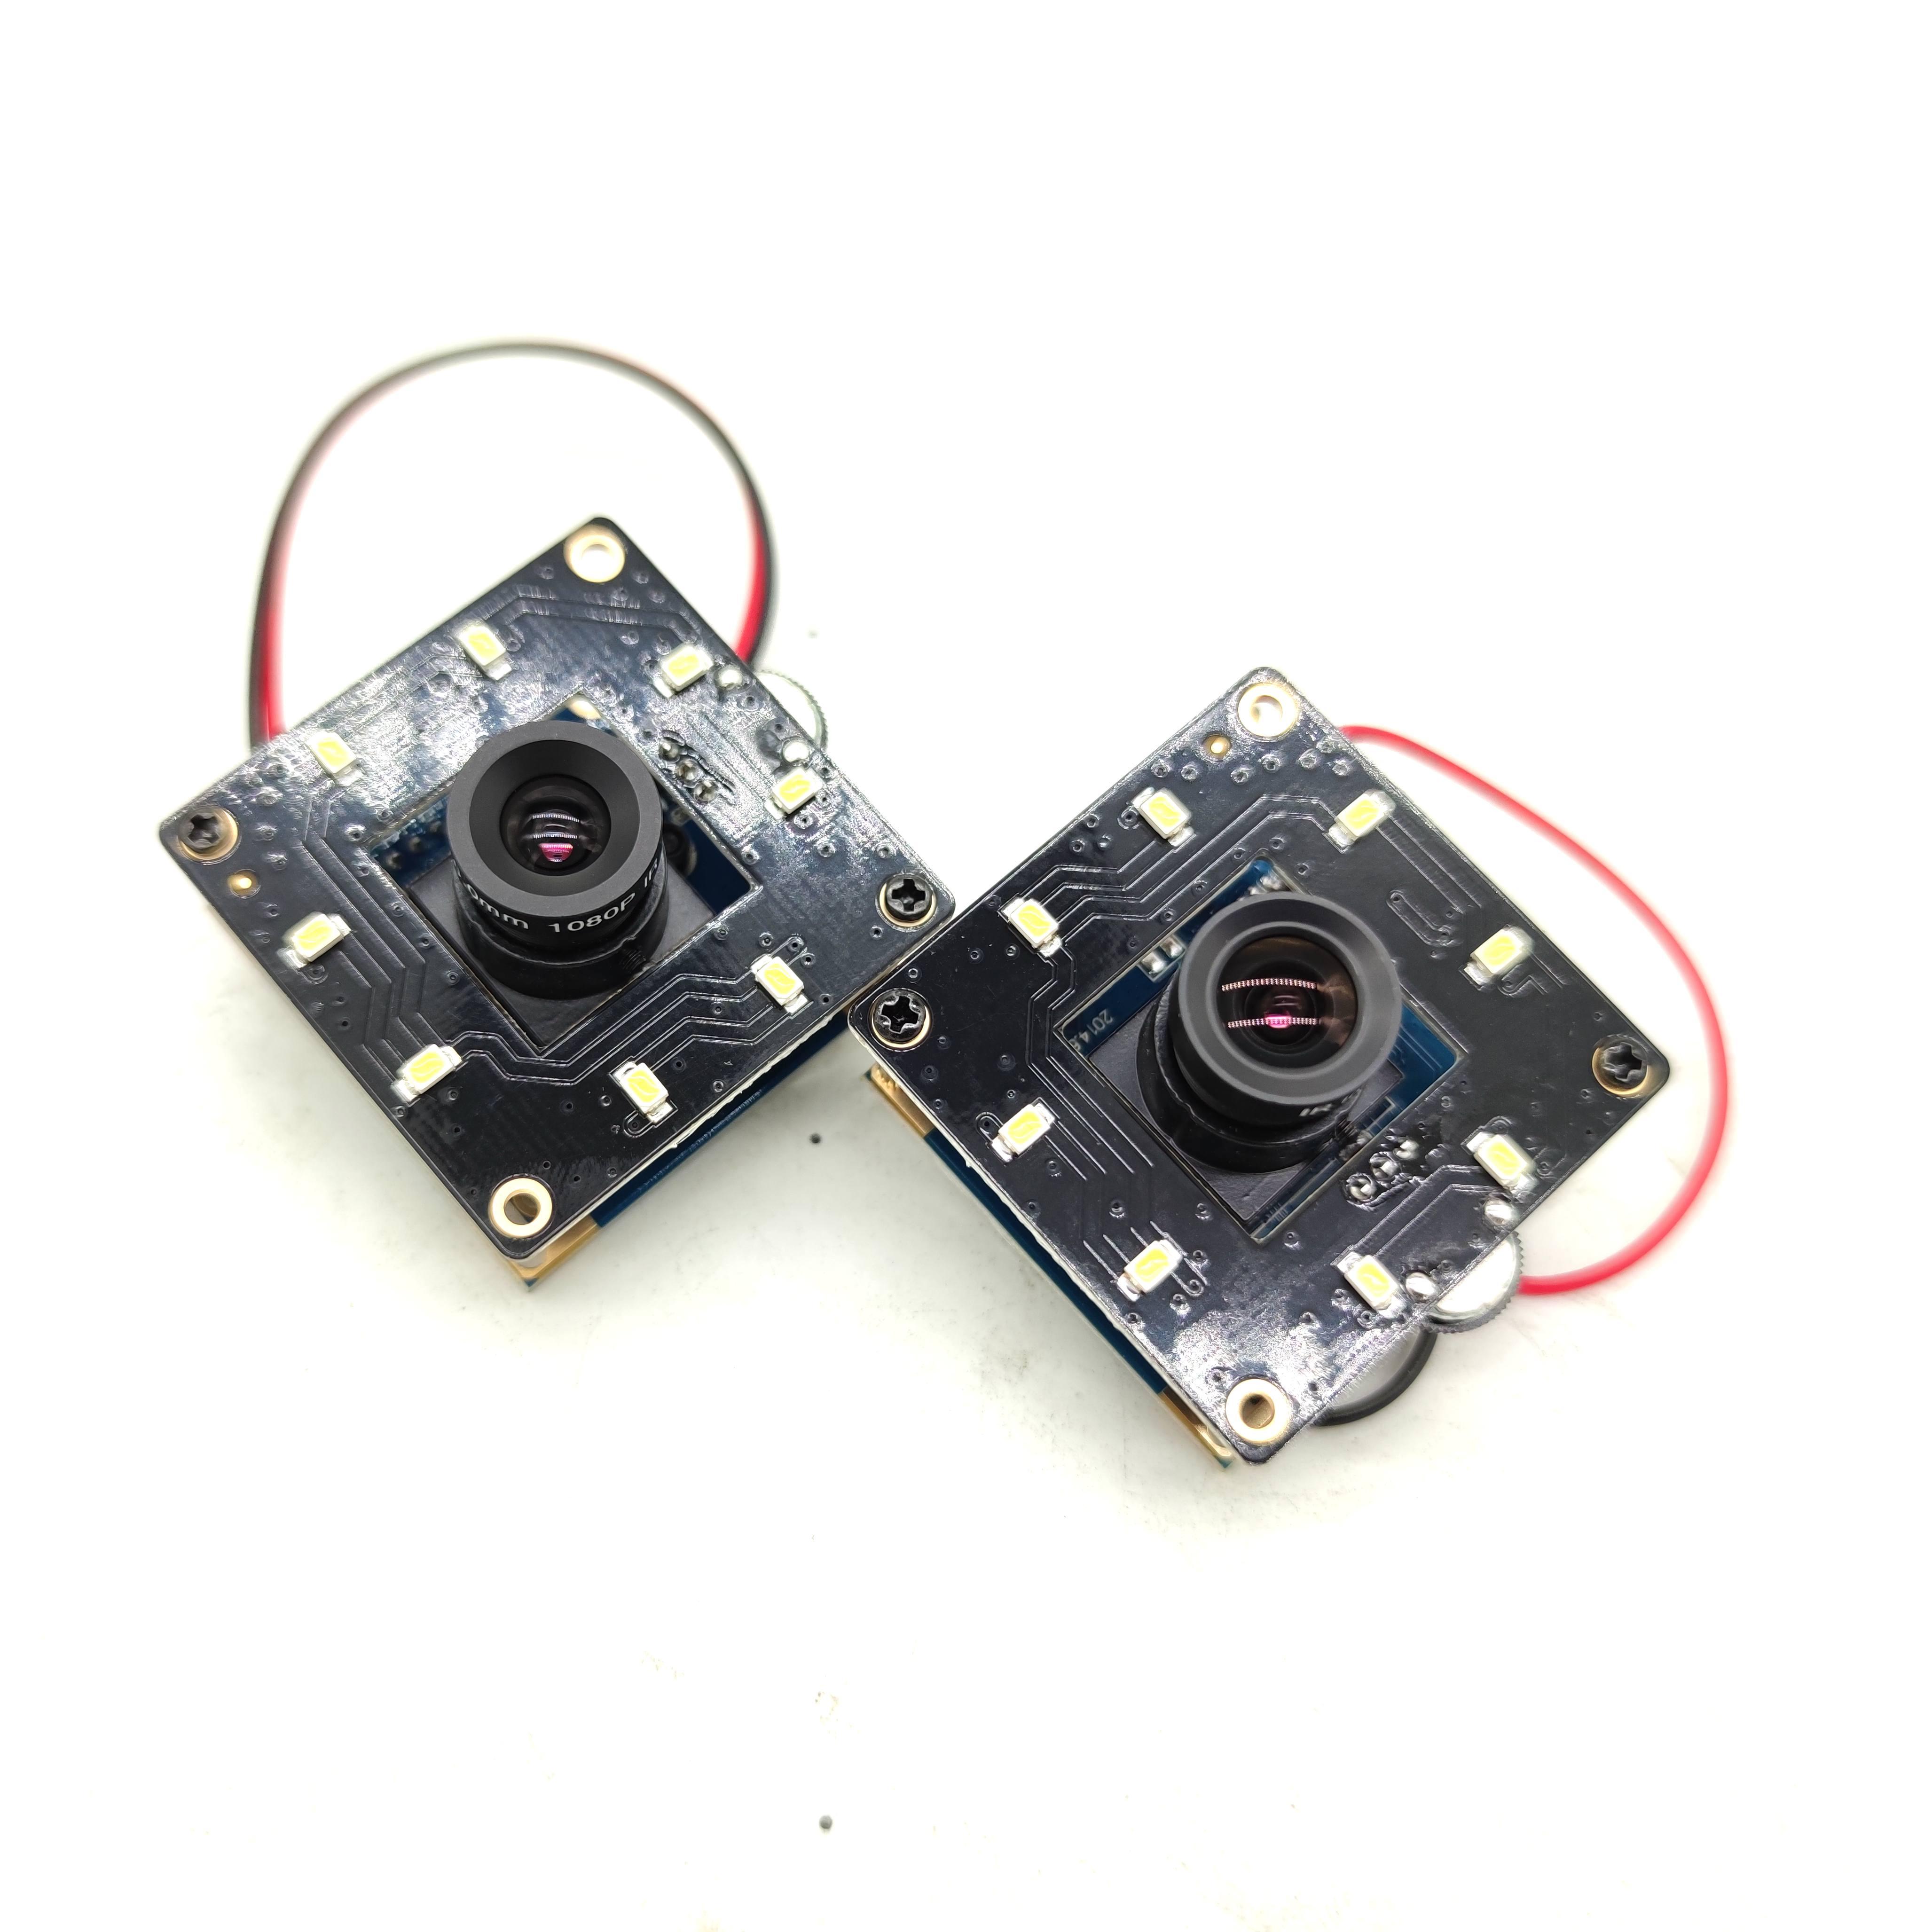 LED OpenPnP USB Interface 1.0MP 720P Vision Camera 3.6/6mm Focal Length USB100W